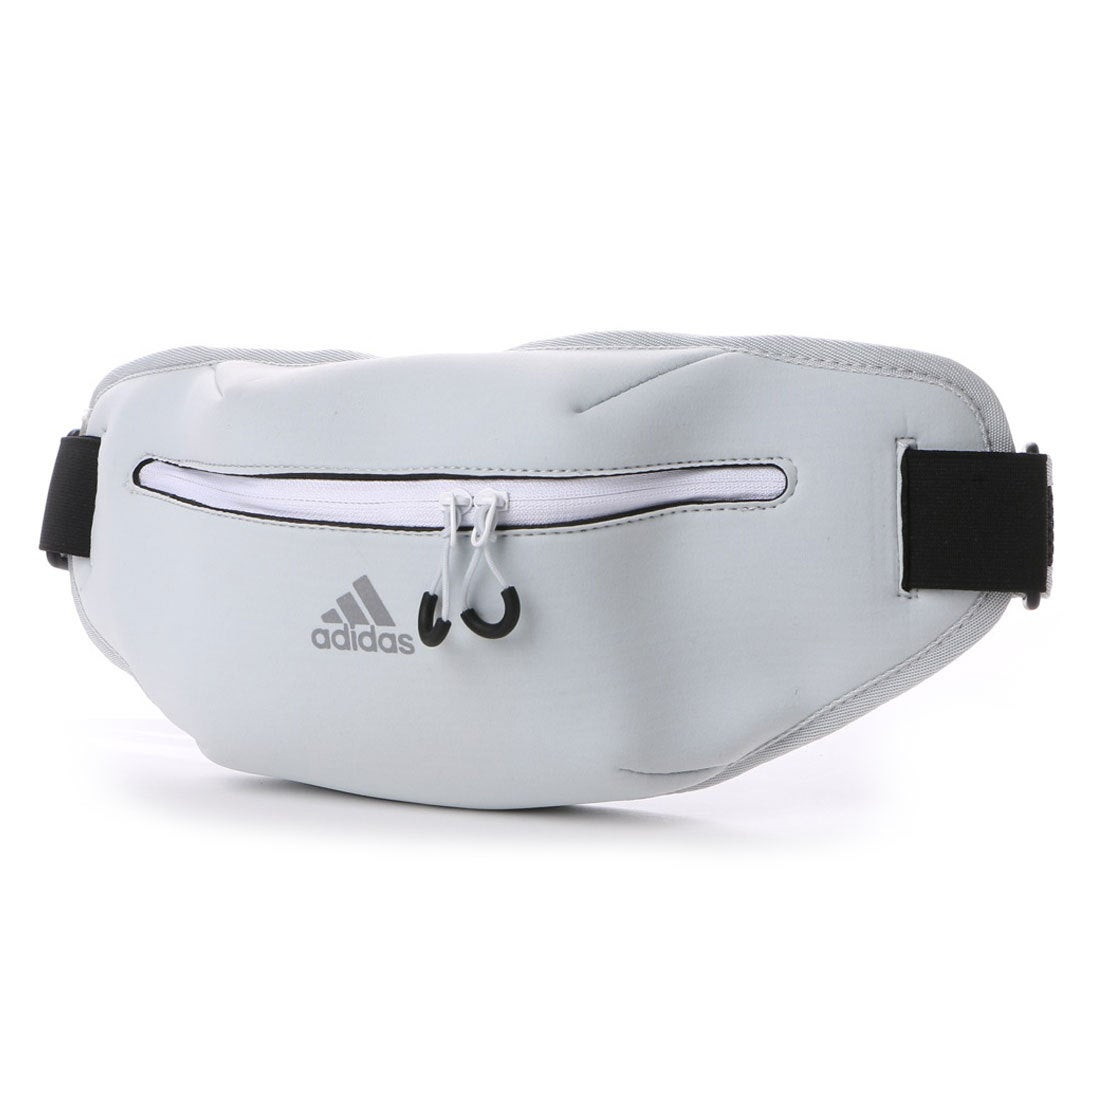 【SALE 7%OFF】アディダス adidas ユニセックス 陸上/ランニング ウエストバッグ ランニング ウエストポーチ AZ4202 (グレー)